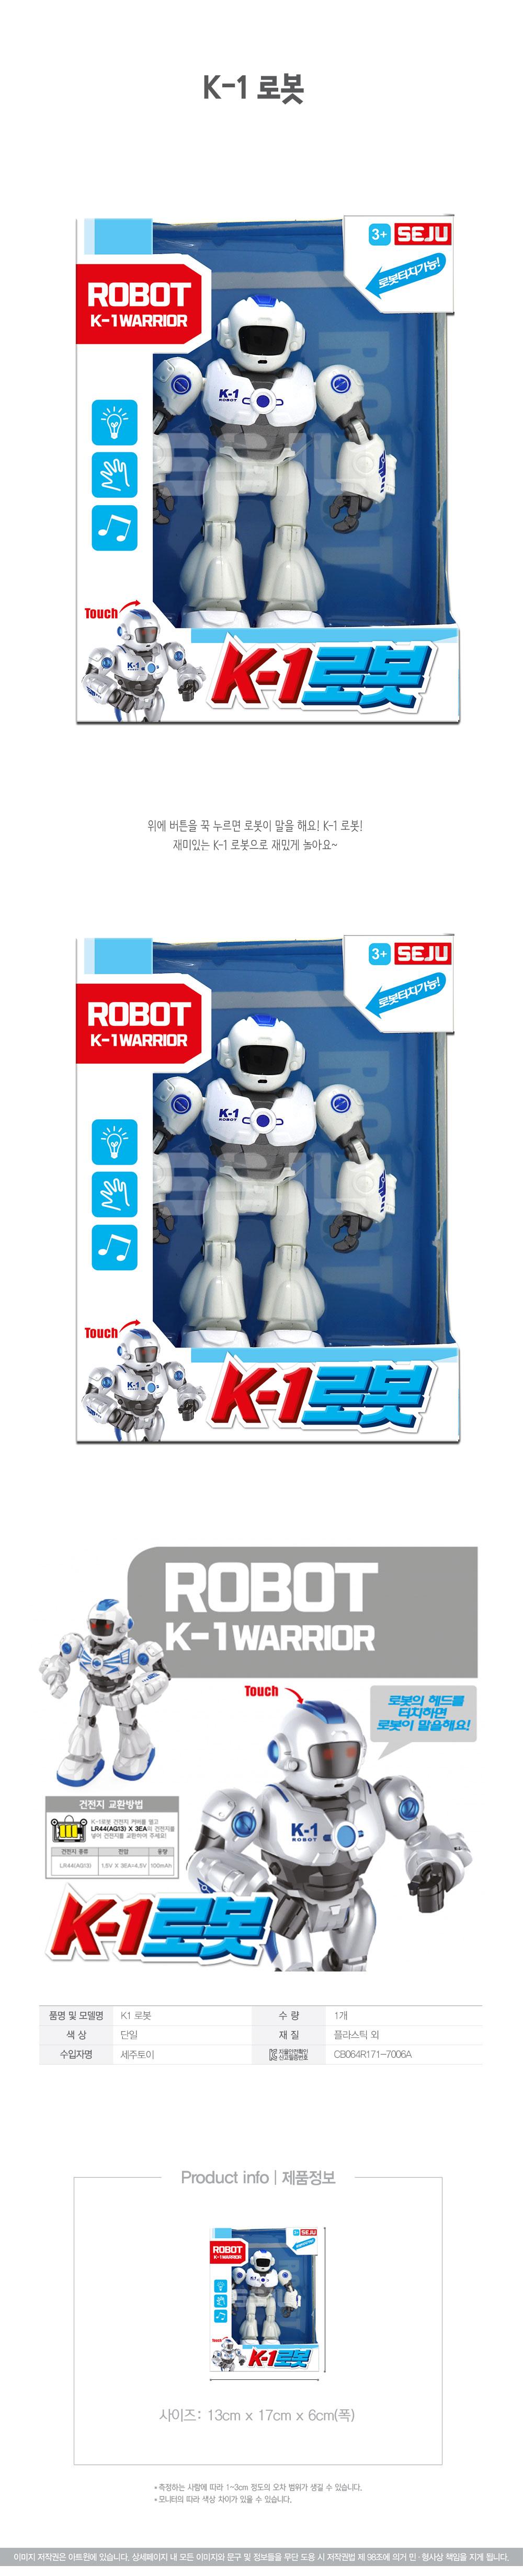 10000K-1로봇 로봇장난감 로봇완구 작동완구 말하는로봇 남아완구10,000원-아트윈키덜트/취미, 장난감/게임기, 로봇/틴토이, 로봇바보사랑10000K-1로봇 로봇장난감 로봇완구 작동완구 말하는로봇 남아완구10,000원-아트윈키덜트/취미, 장난감/게임기, 로봇/틴토이, 로봇바보사랑